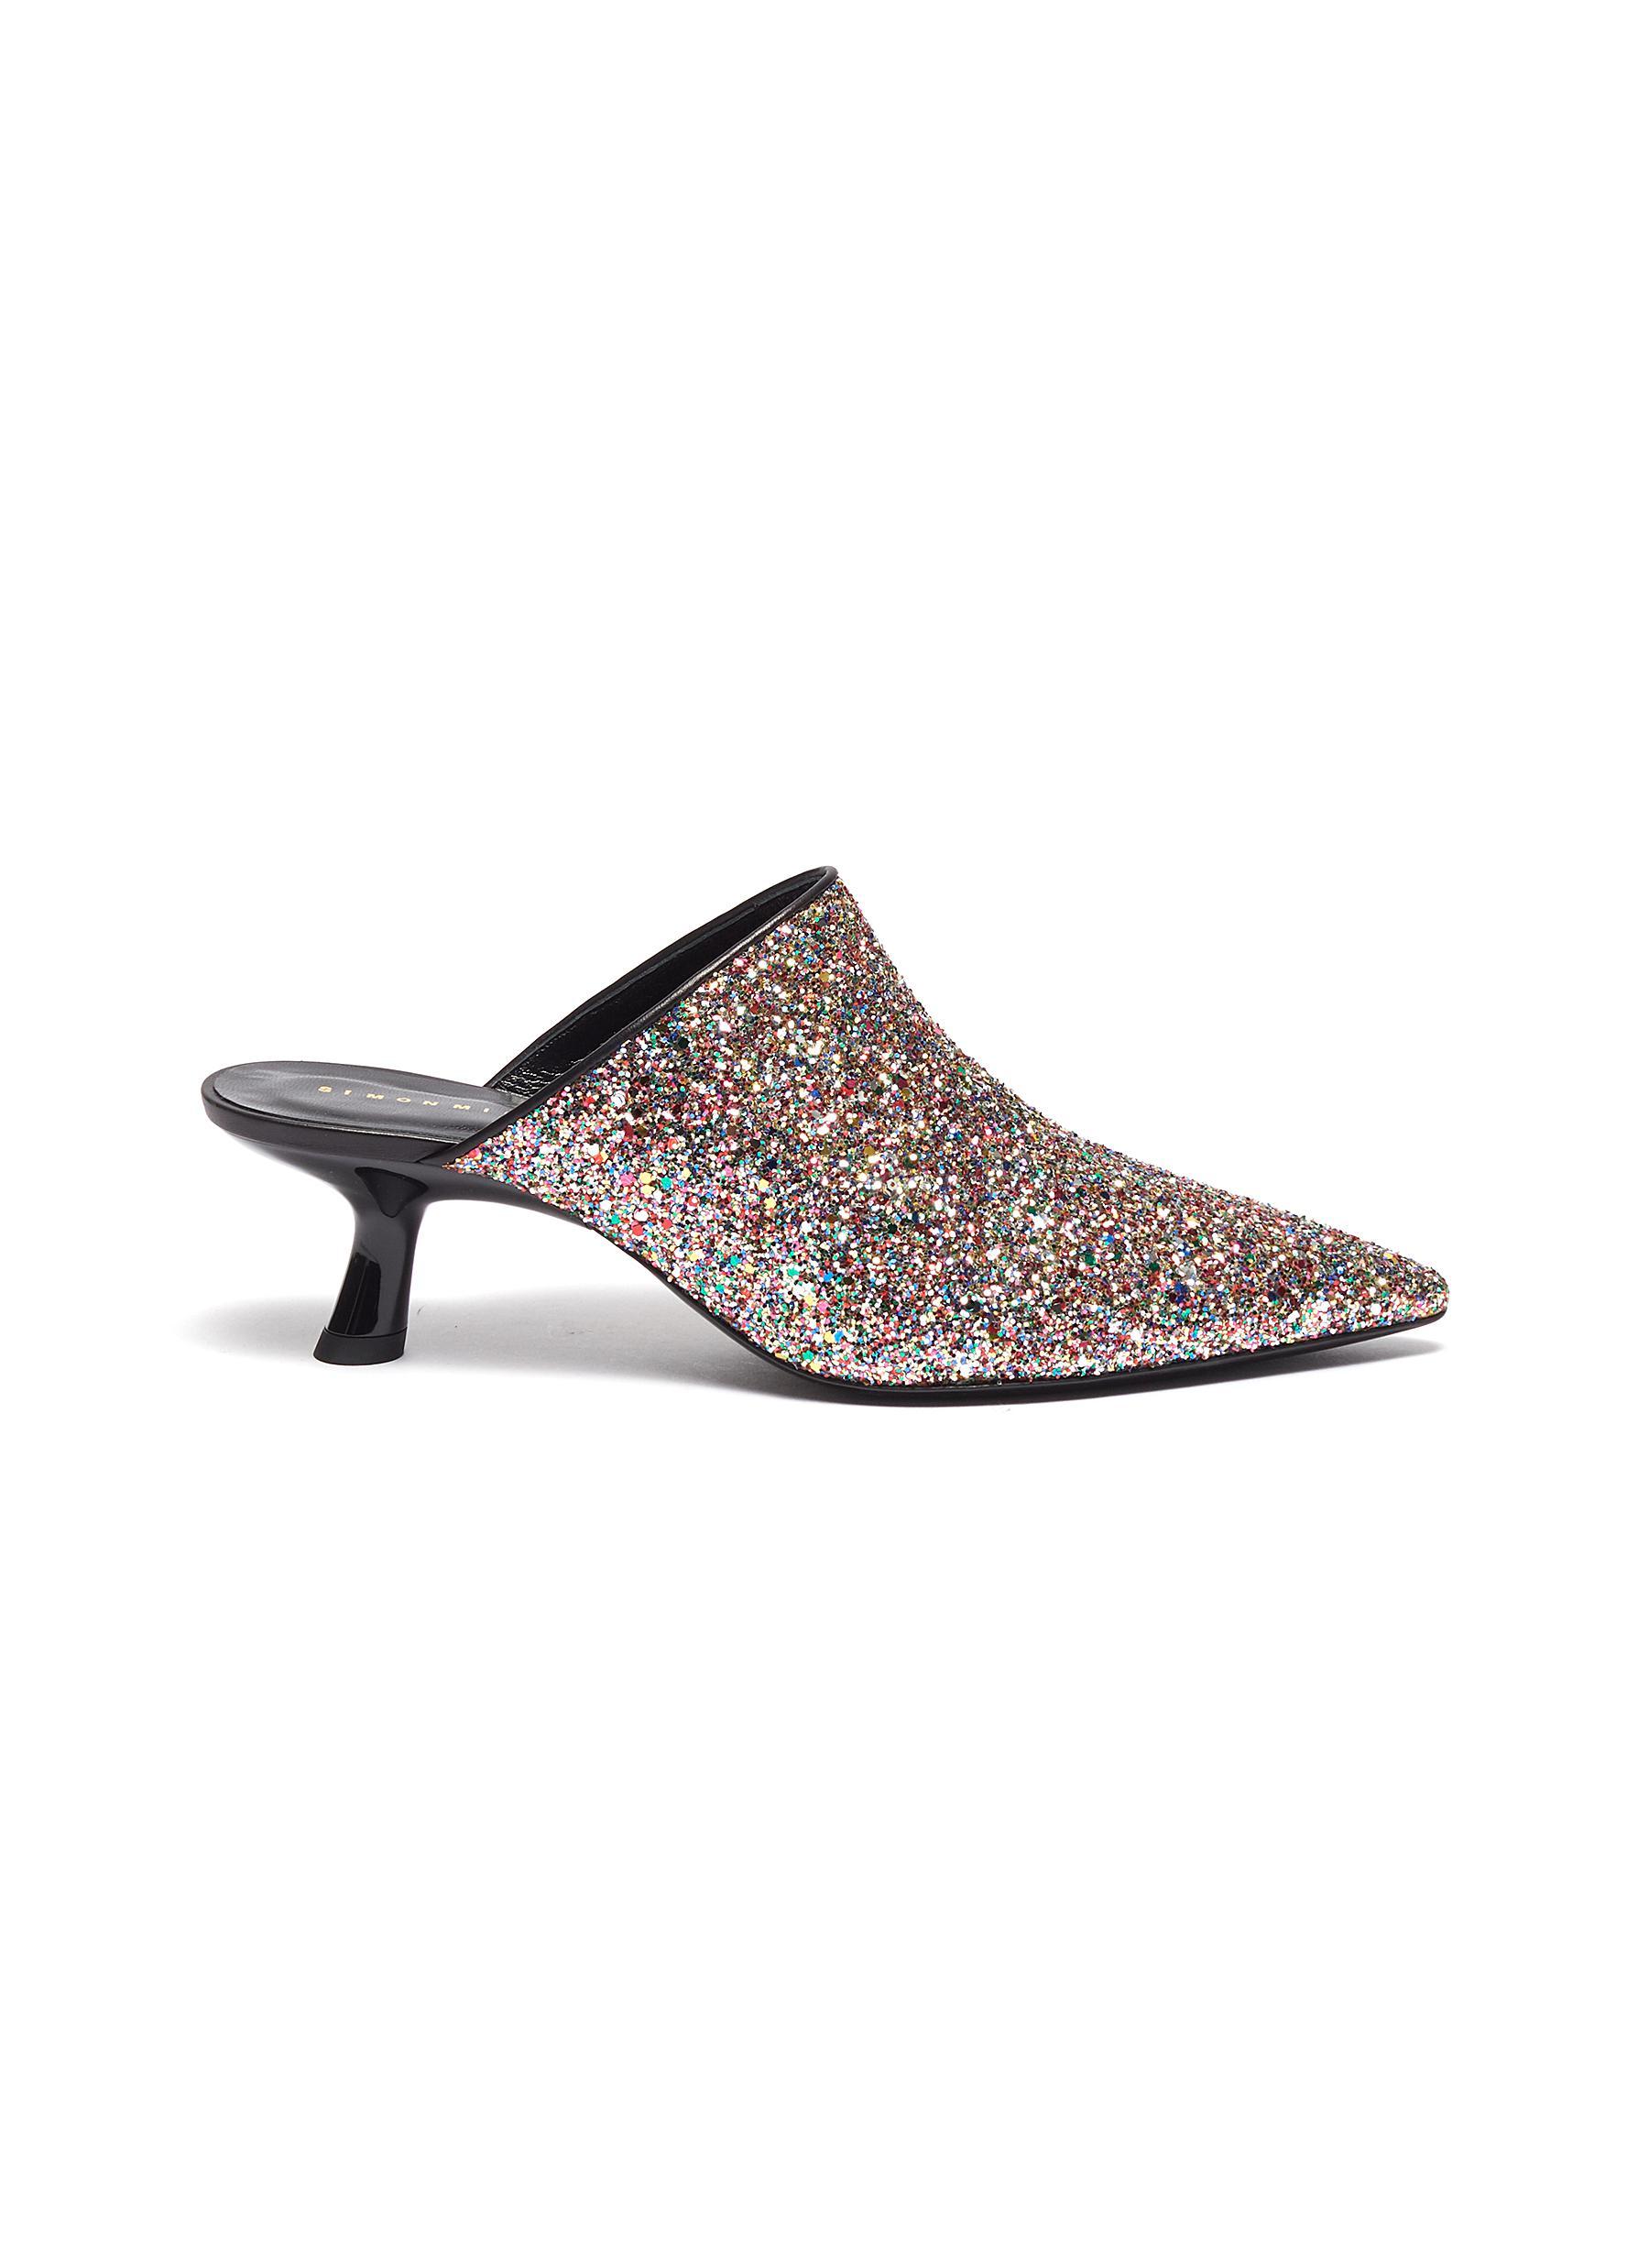 Kicker Tee heel glitter mules by Simon Miller